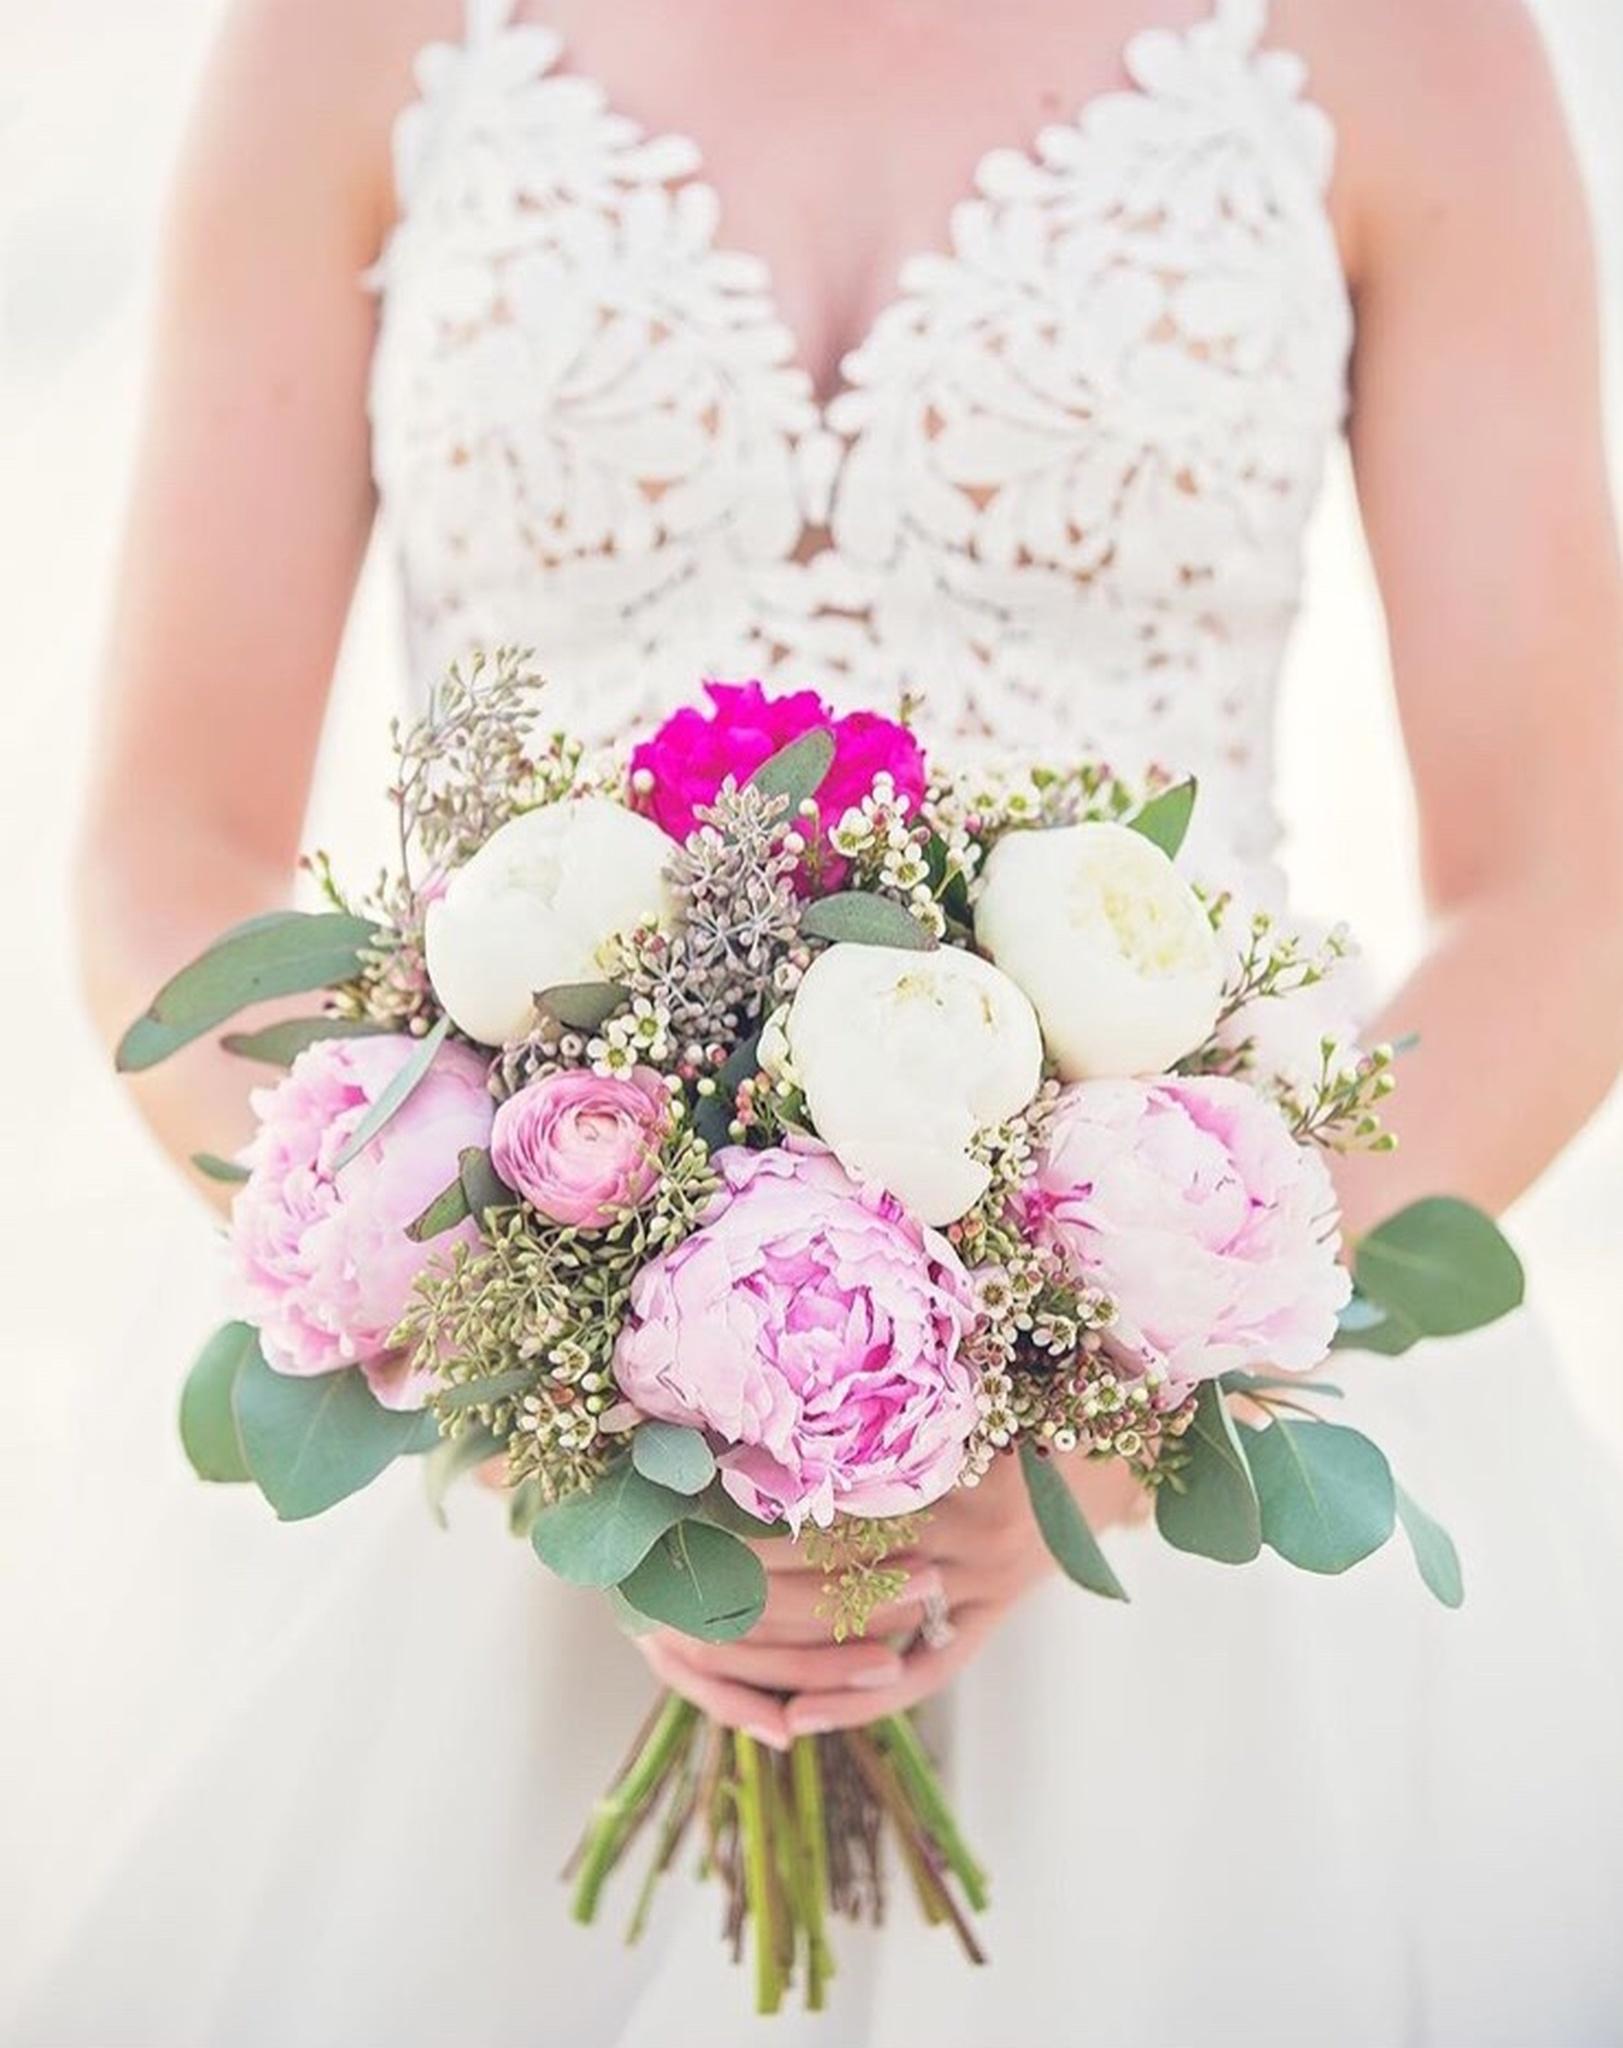 The-Flower-Dell-Cayman-Island-Pink-Bouquet.jpg